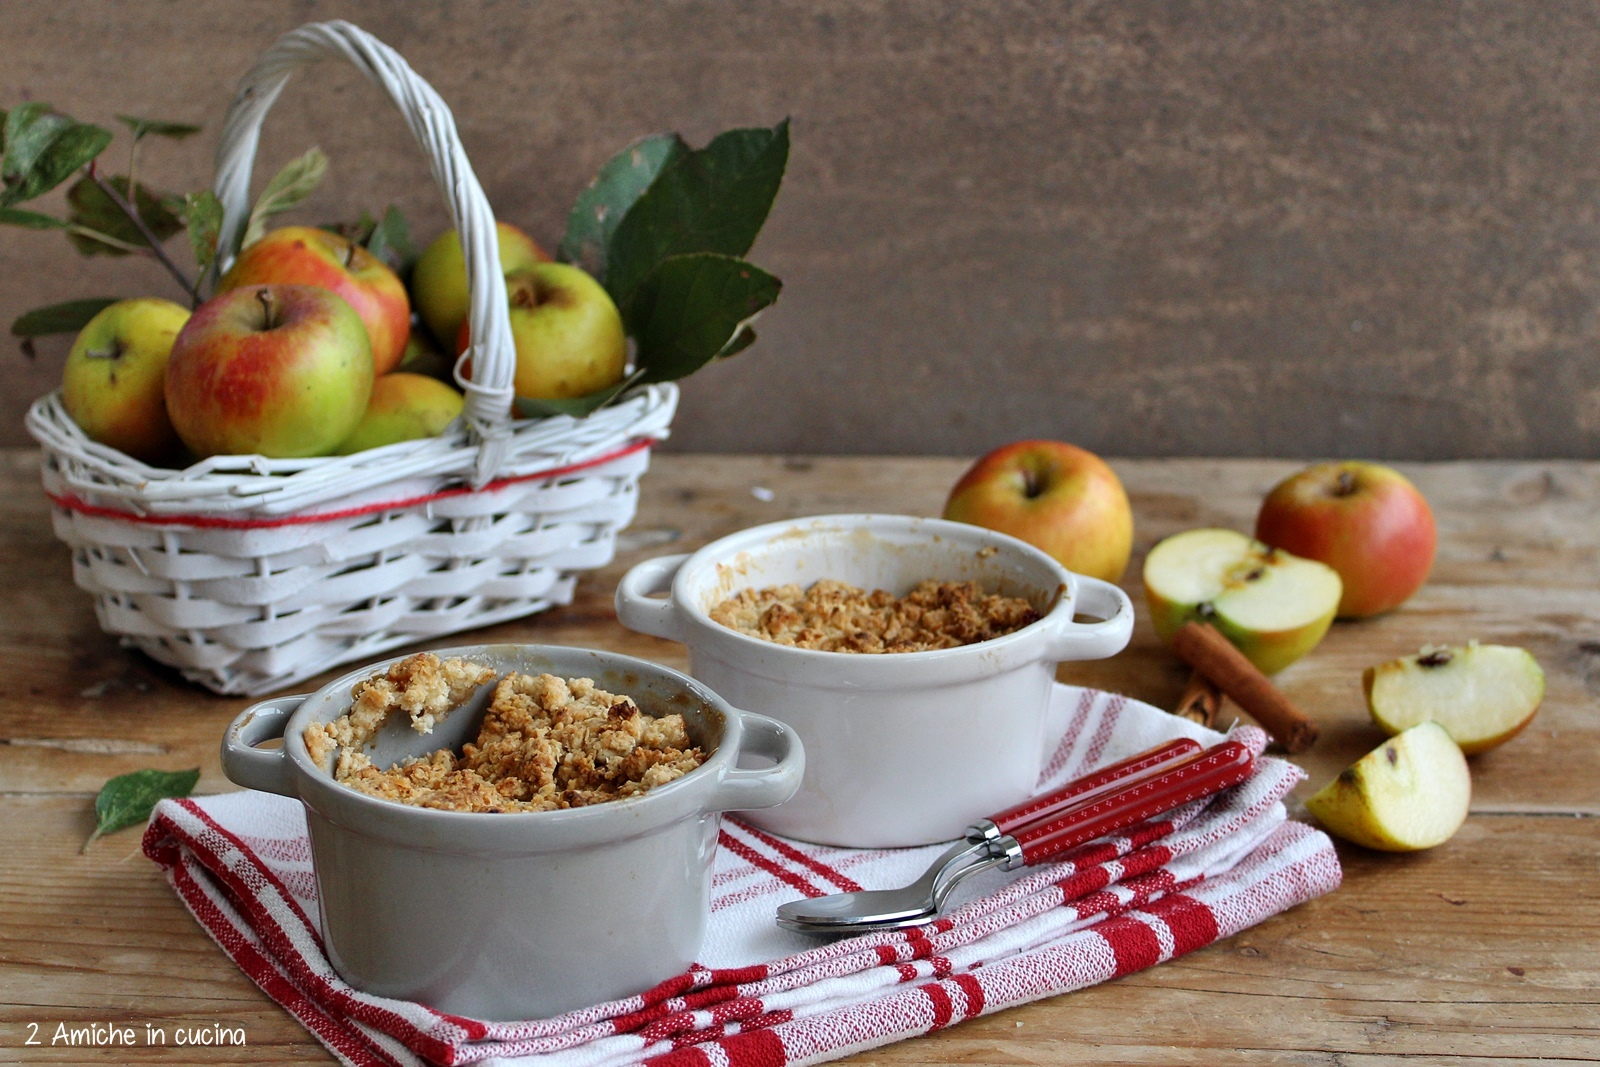 Crumble di mele (Apple crumble inglese) - 2 Amiche in Cucina